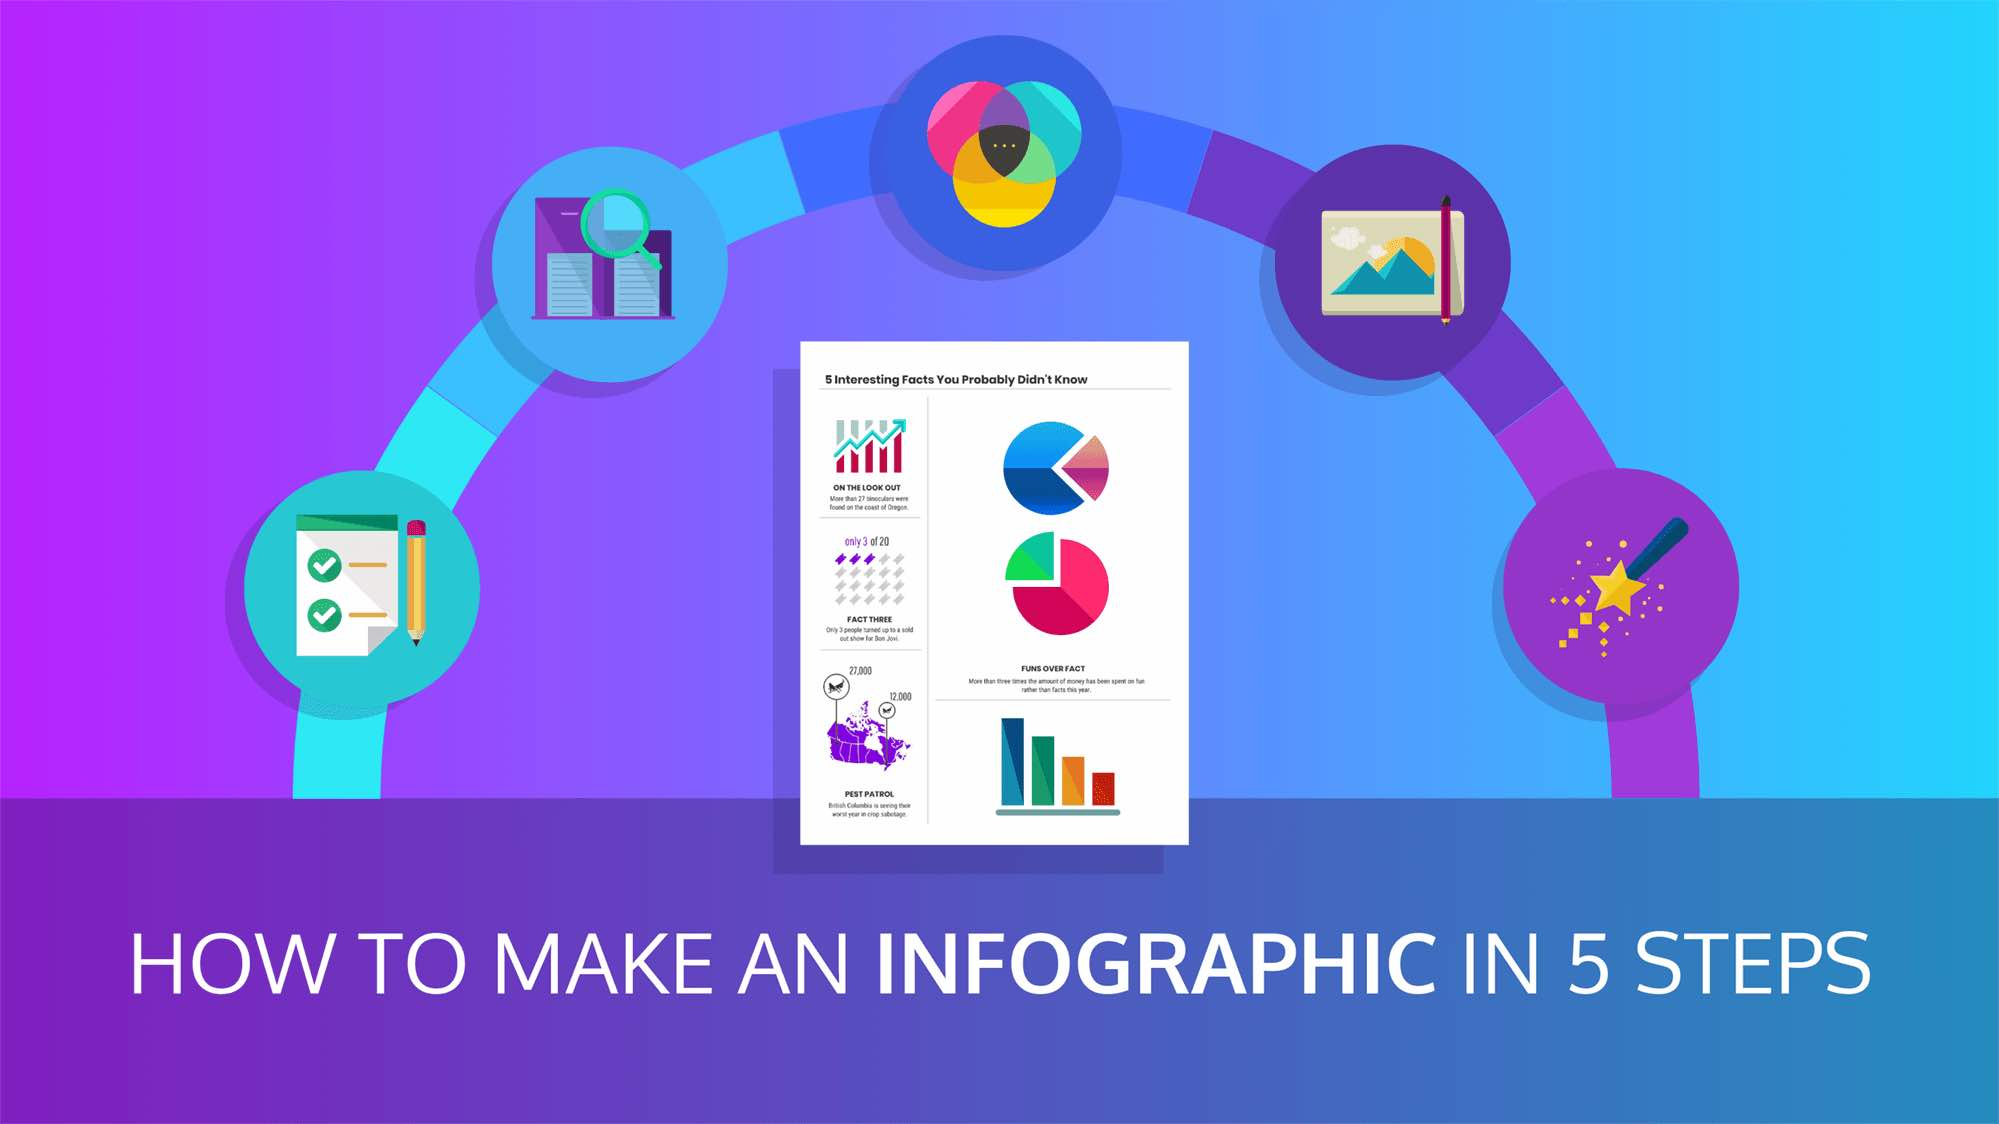 cach-tao-infographic-voi-5-buoc-blog-header